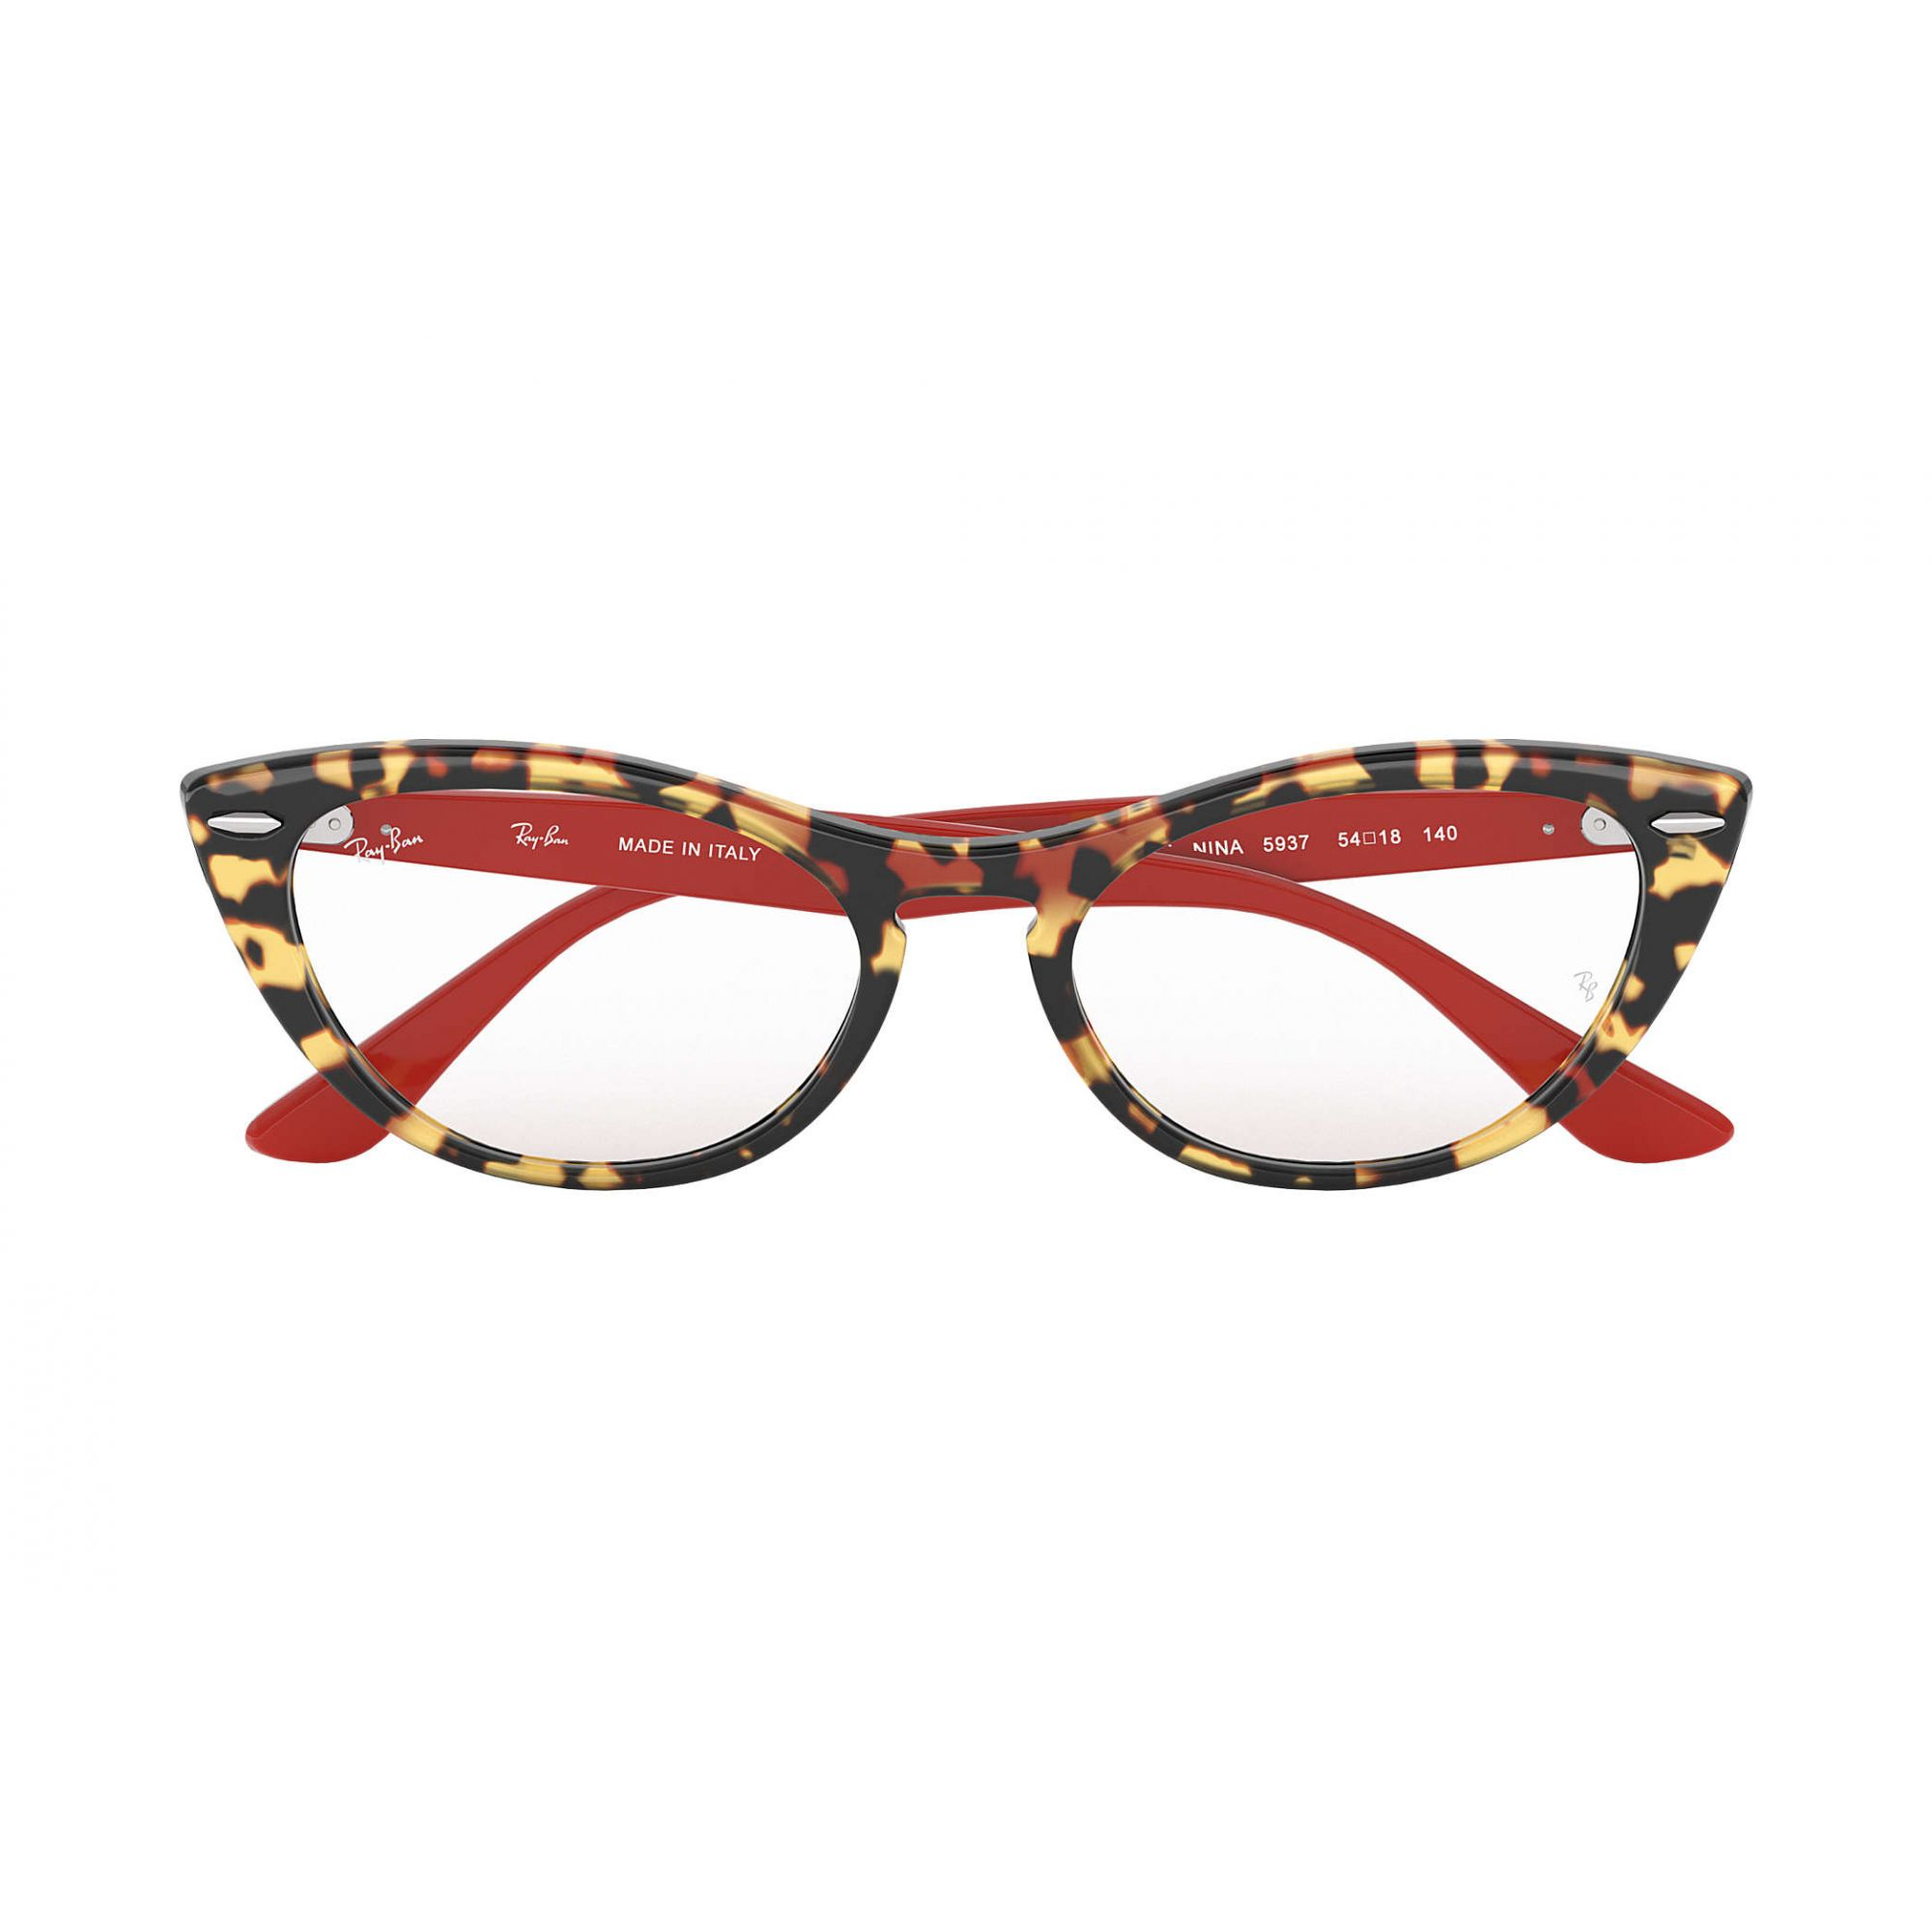 Ray Ban - RB4314V 5937 - Óculos de grau